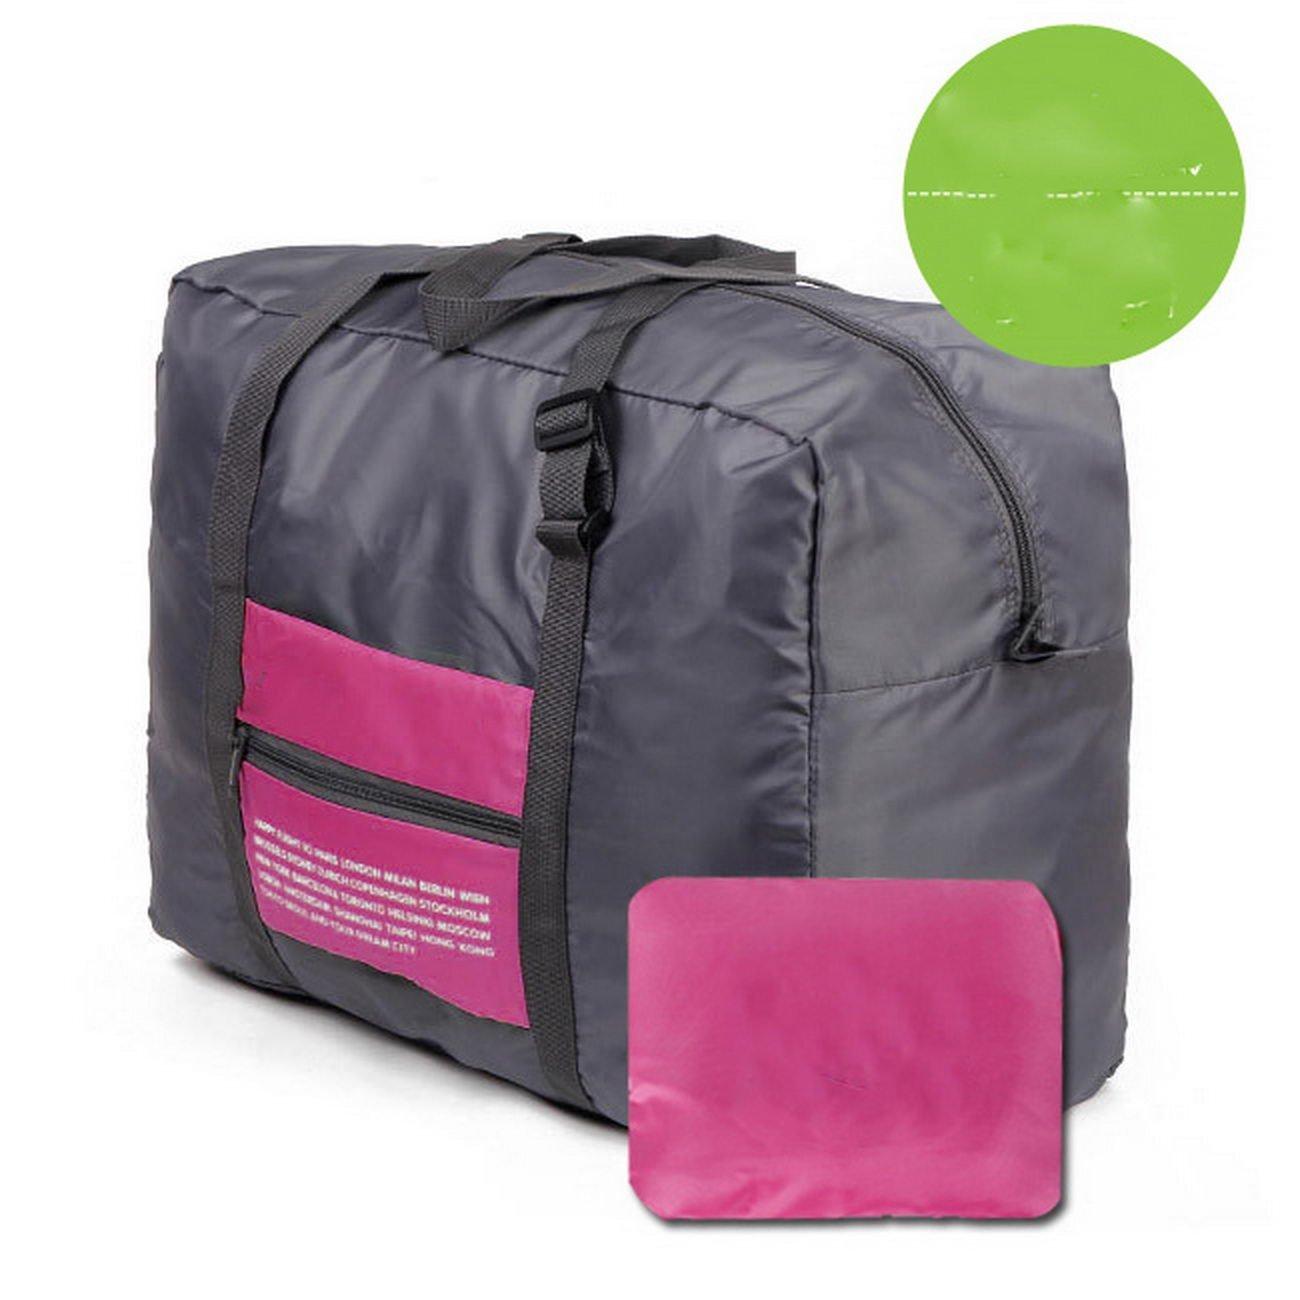 74f610c791e12 Get Quotations · liuxiyux31liwx8x Collapsible bulk bag